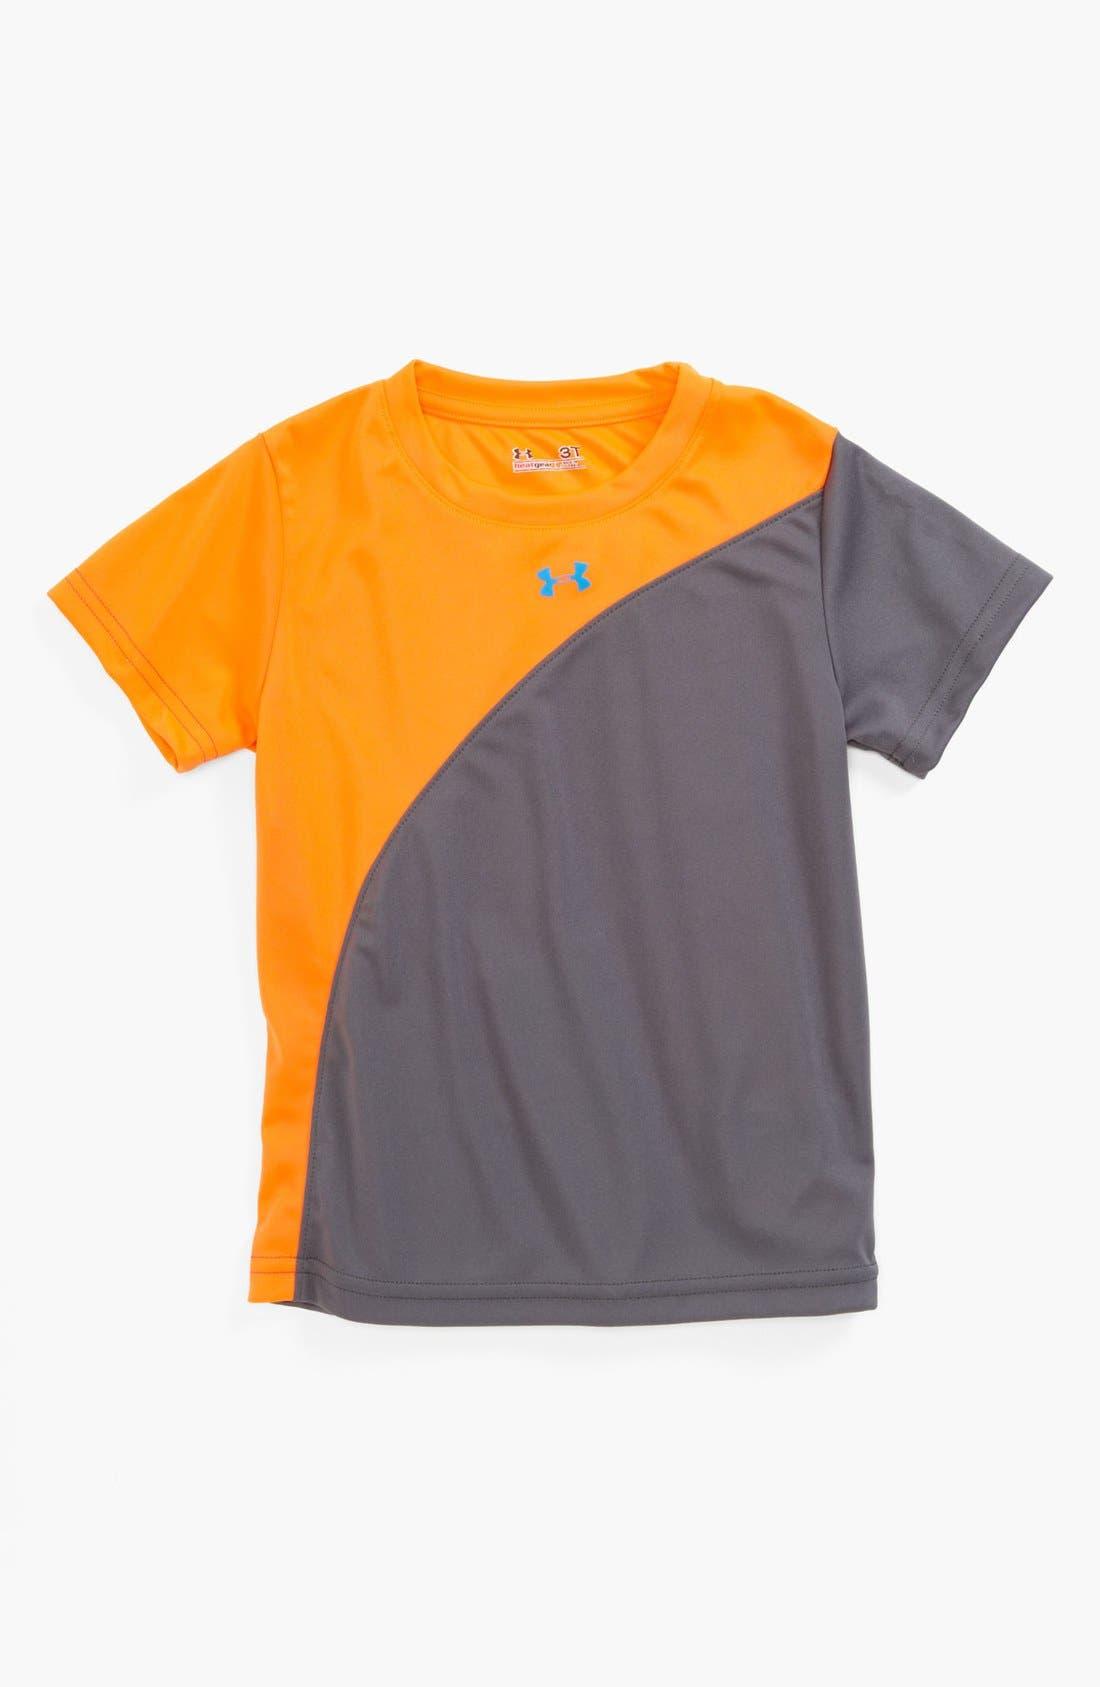 Alternate Image 1 Selected - Under Armour 'Flip' T-Shirt (Toddler)